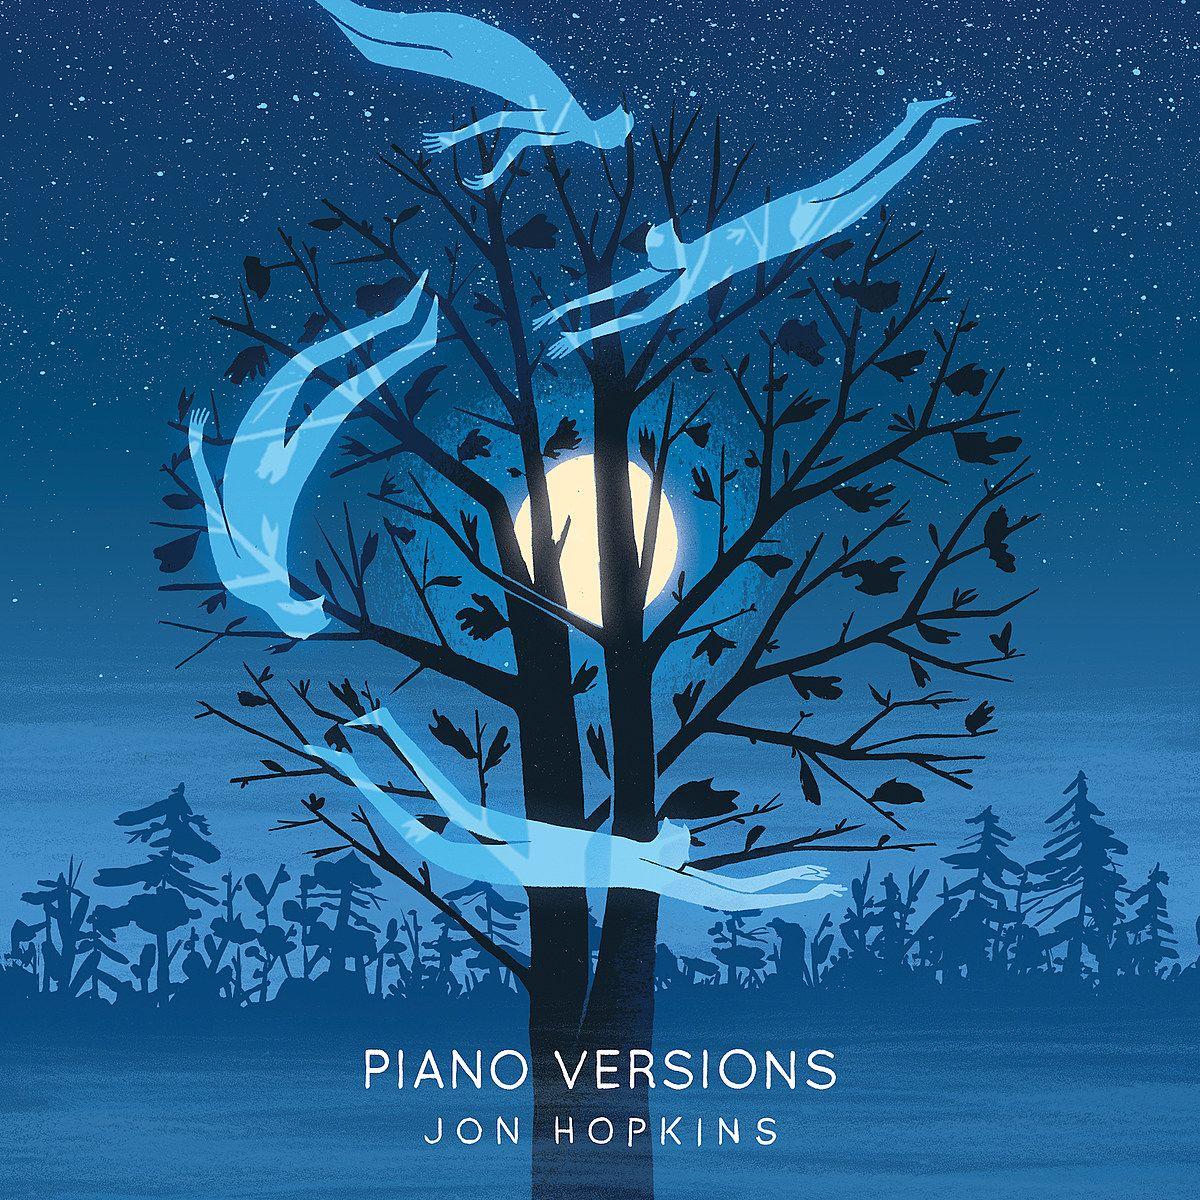 Jon Hopkins - Piano Versions EP - LP